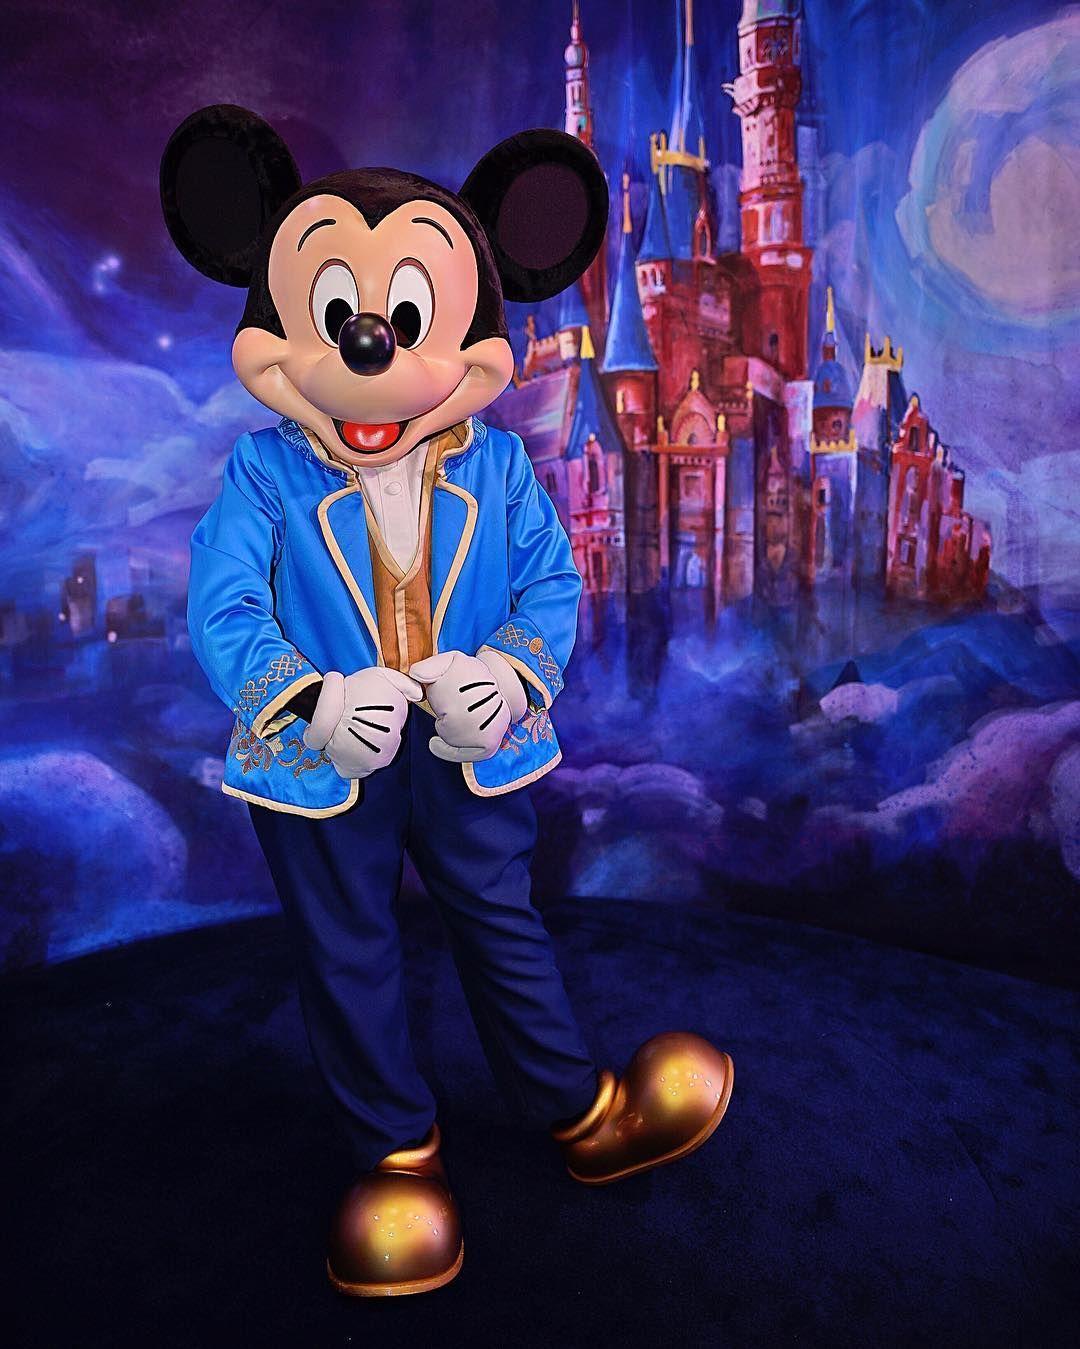 shanghai disney resort mickey mouse mickey mouse pinterest